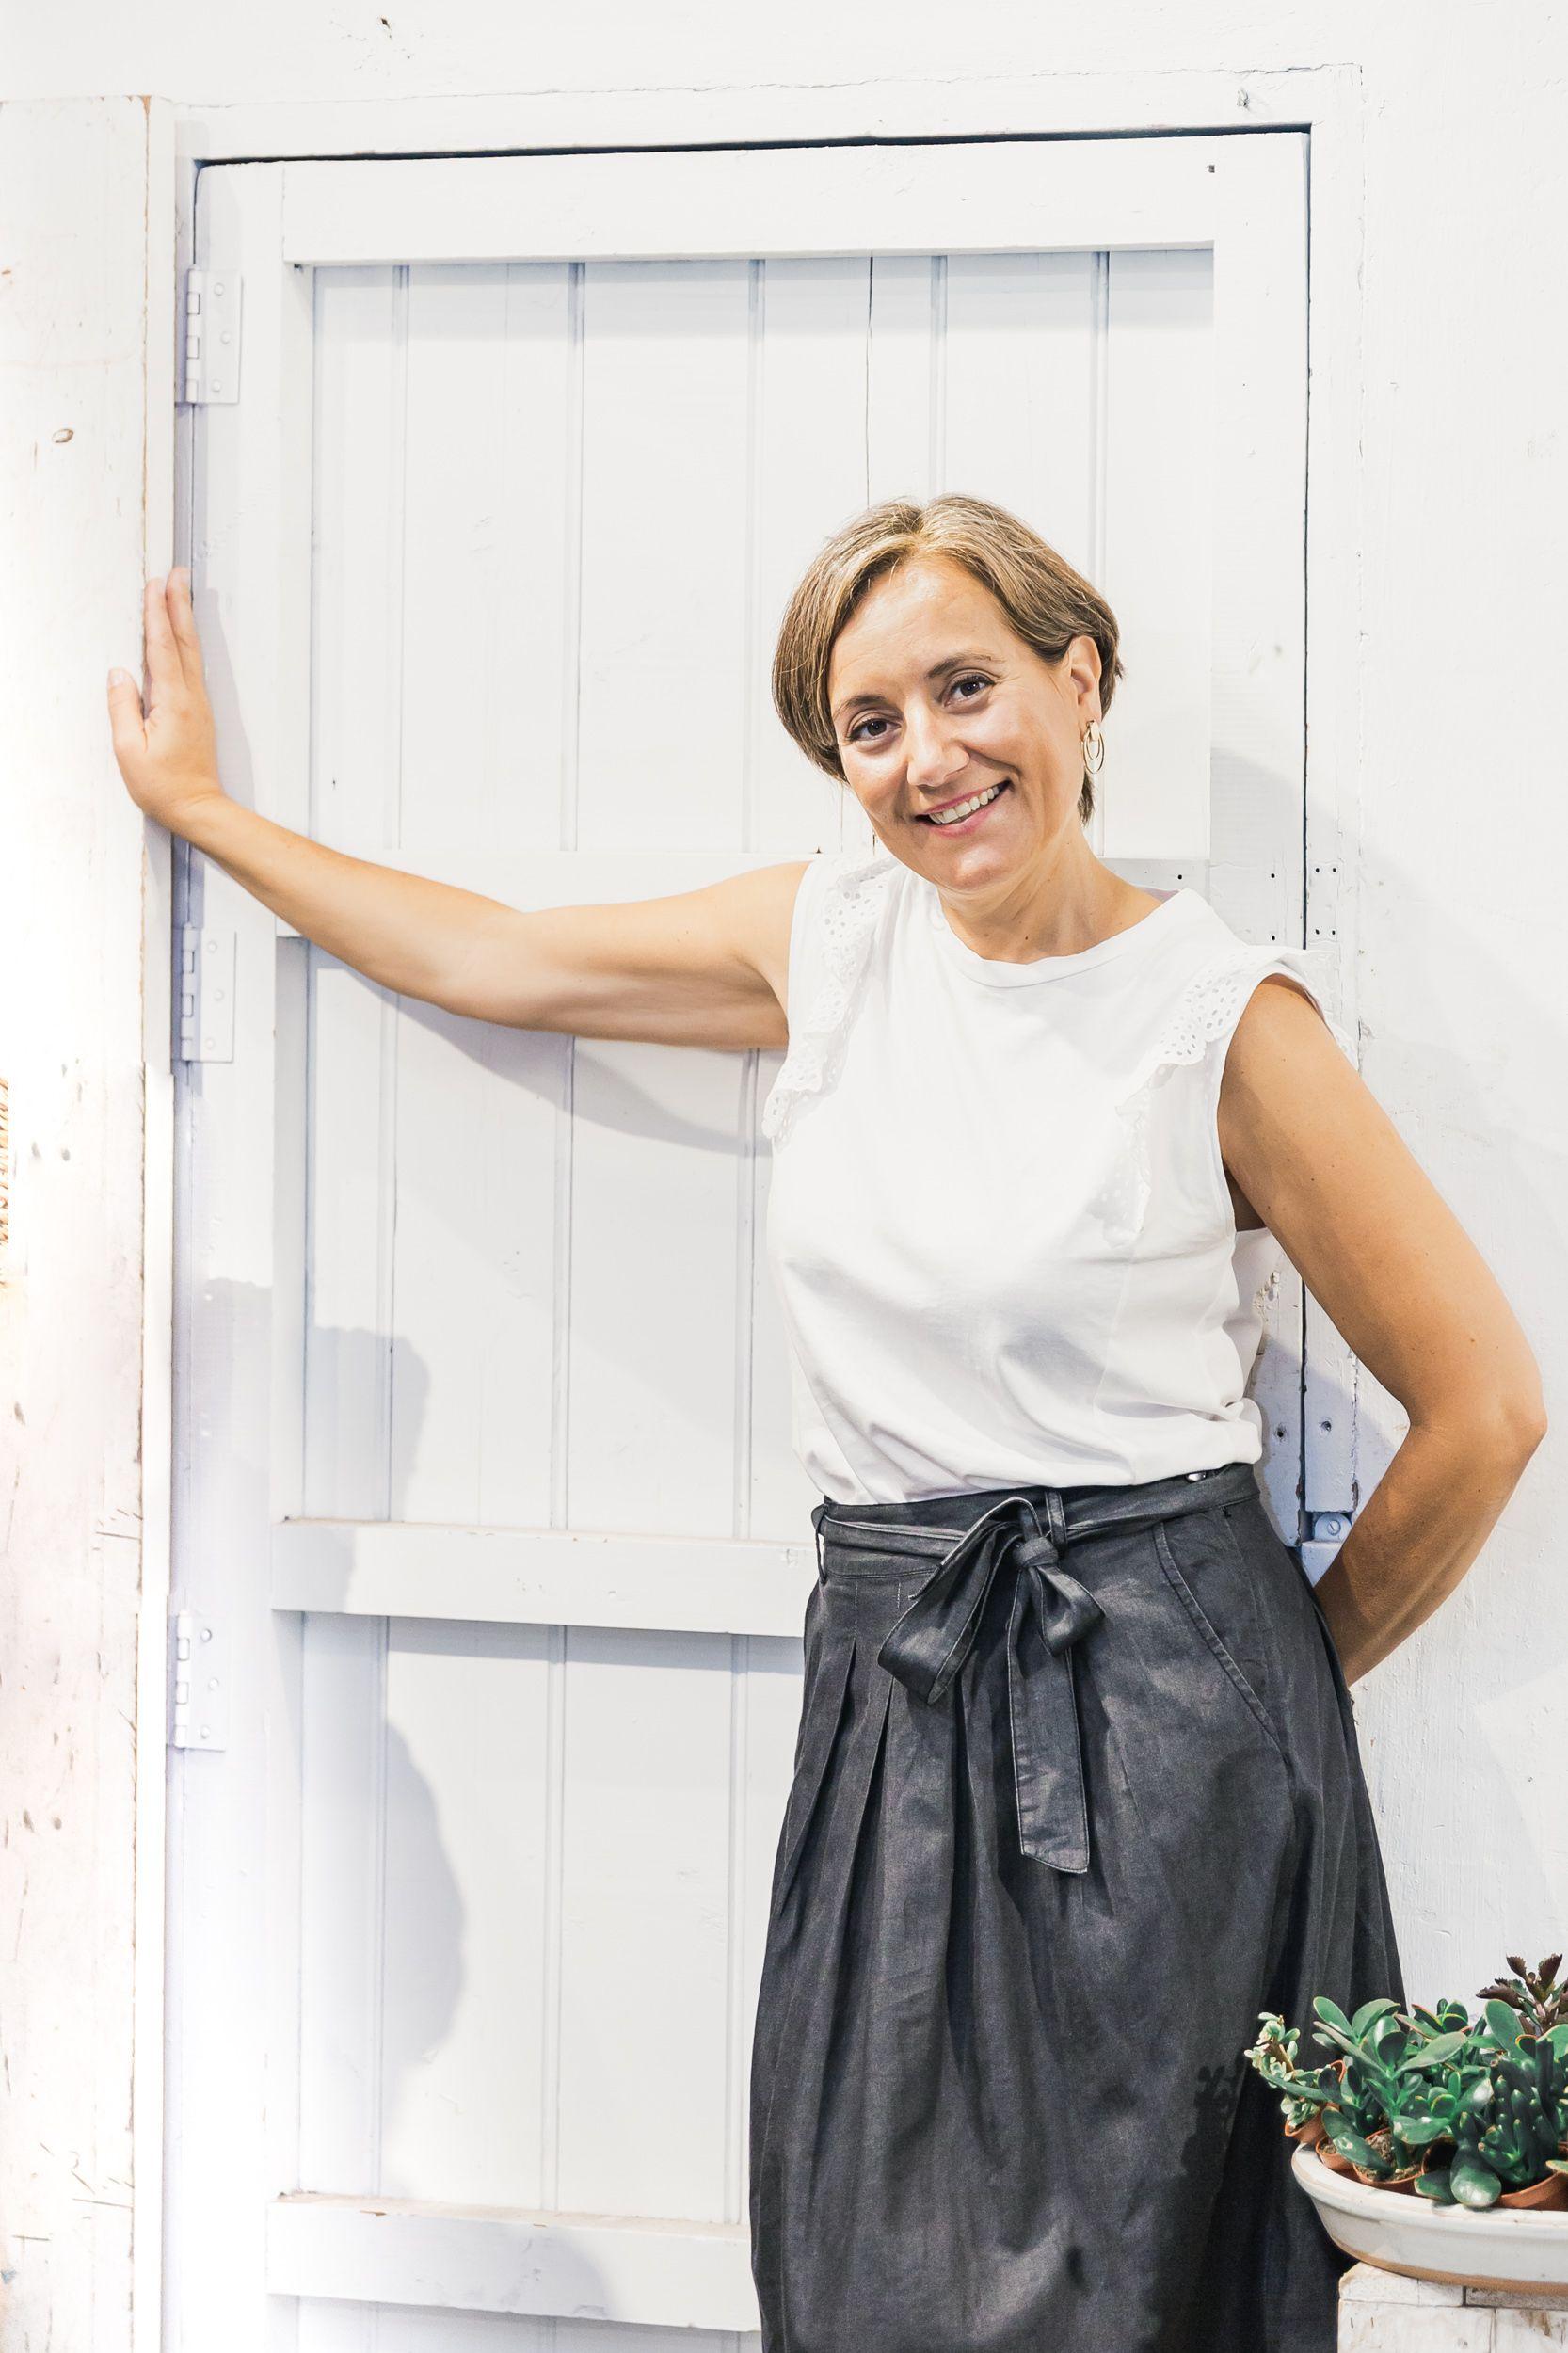 Mónica Garrido